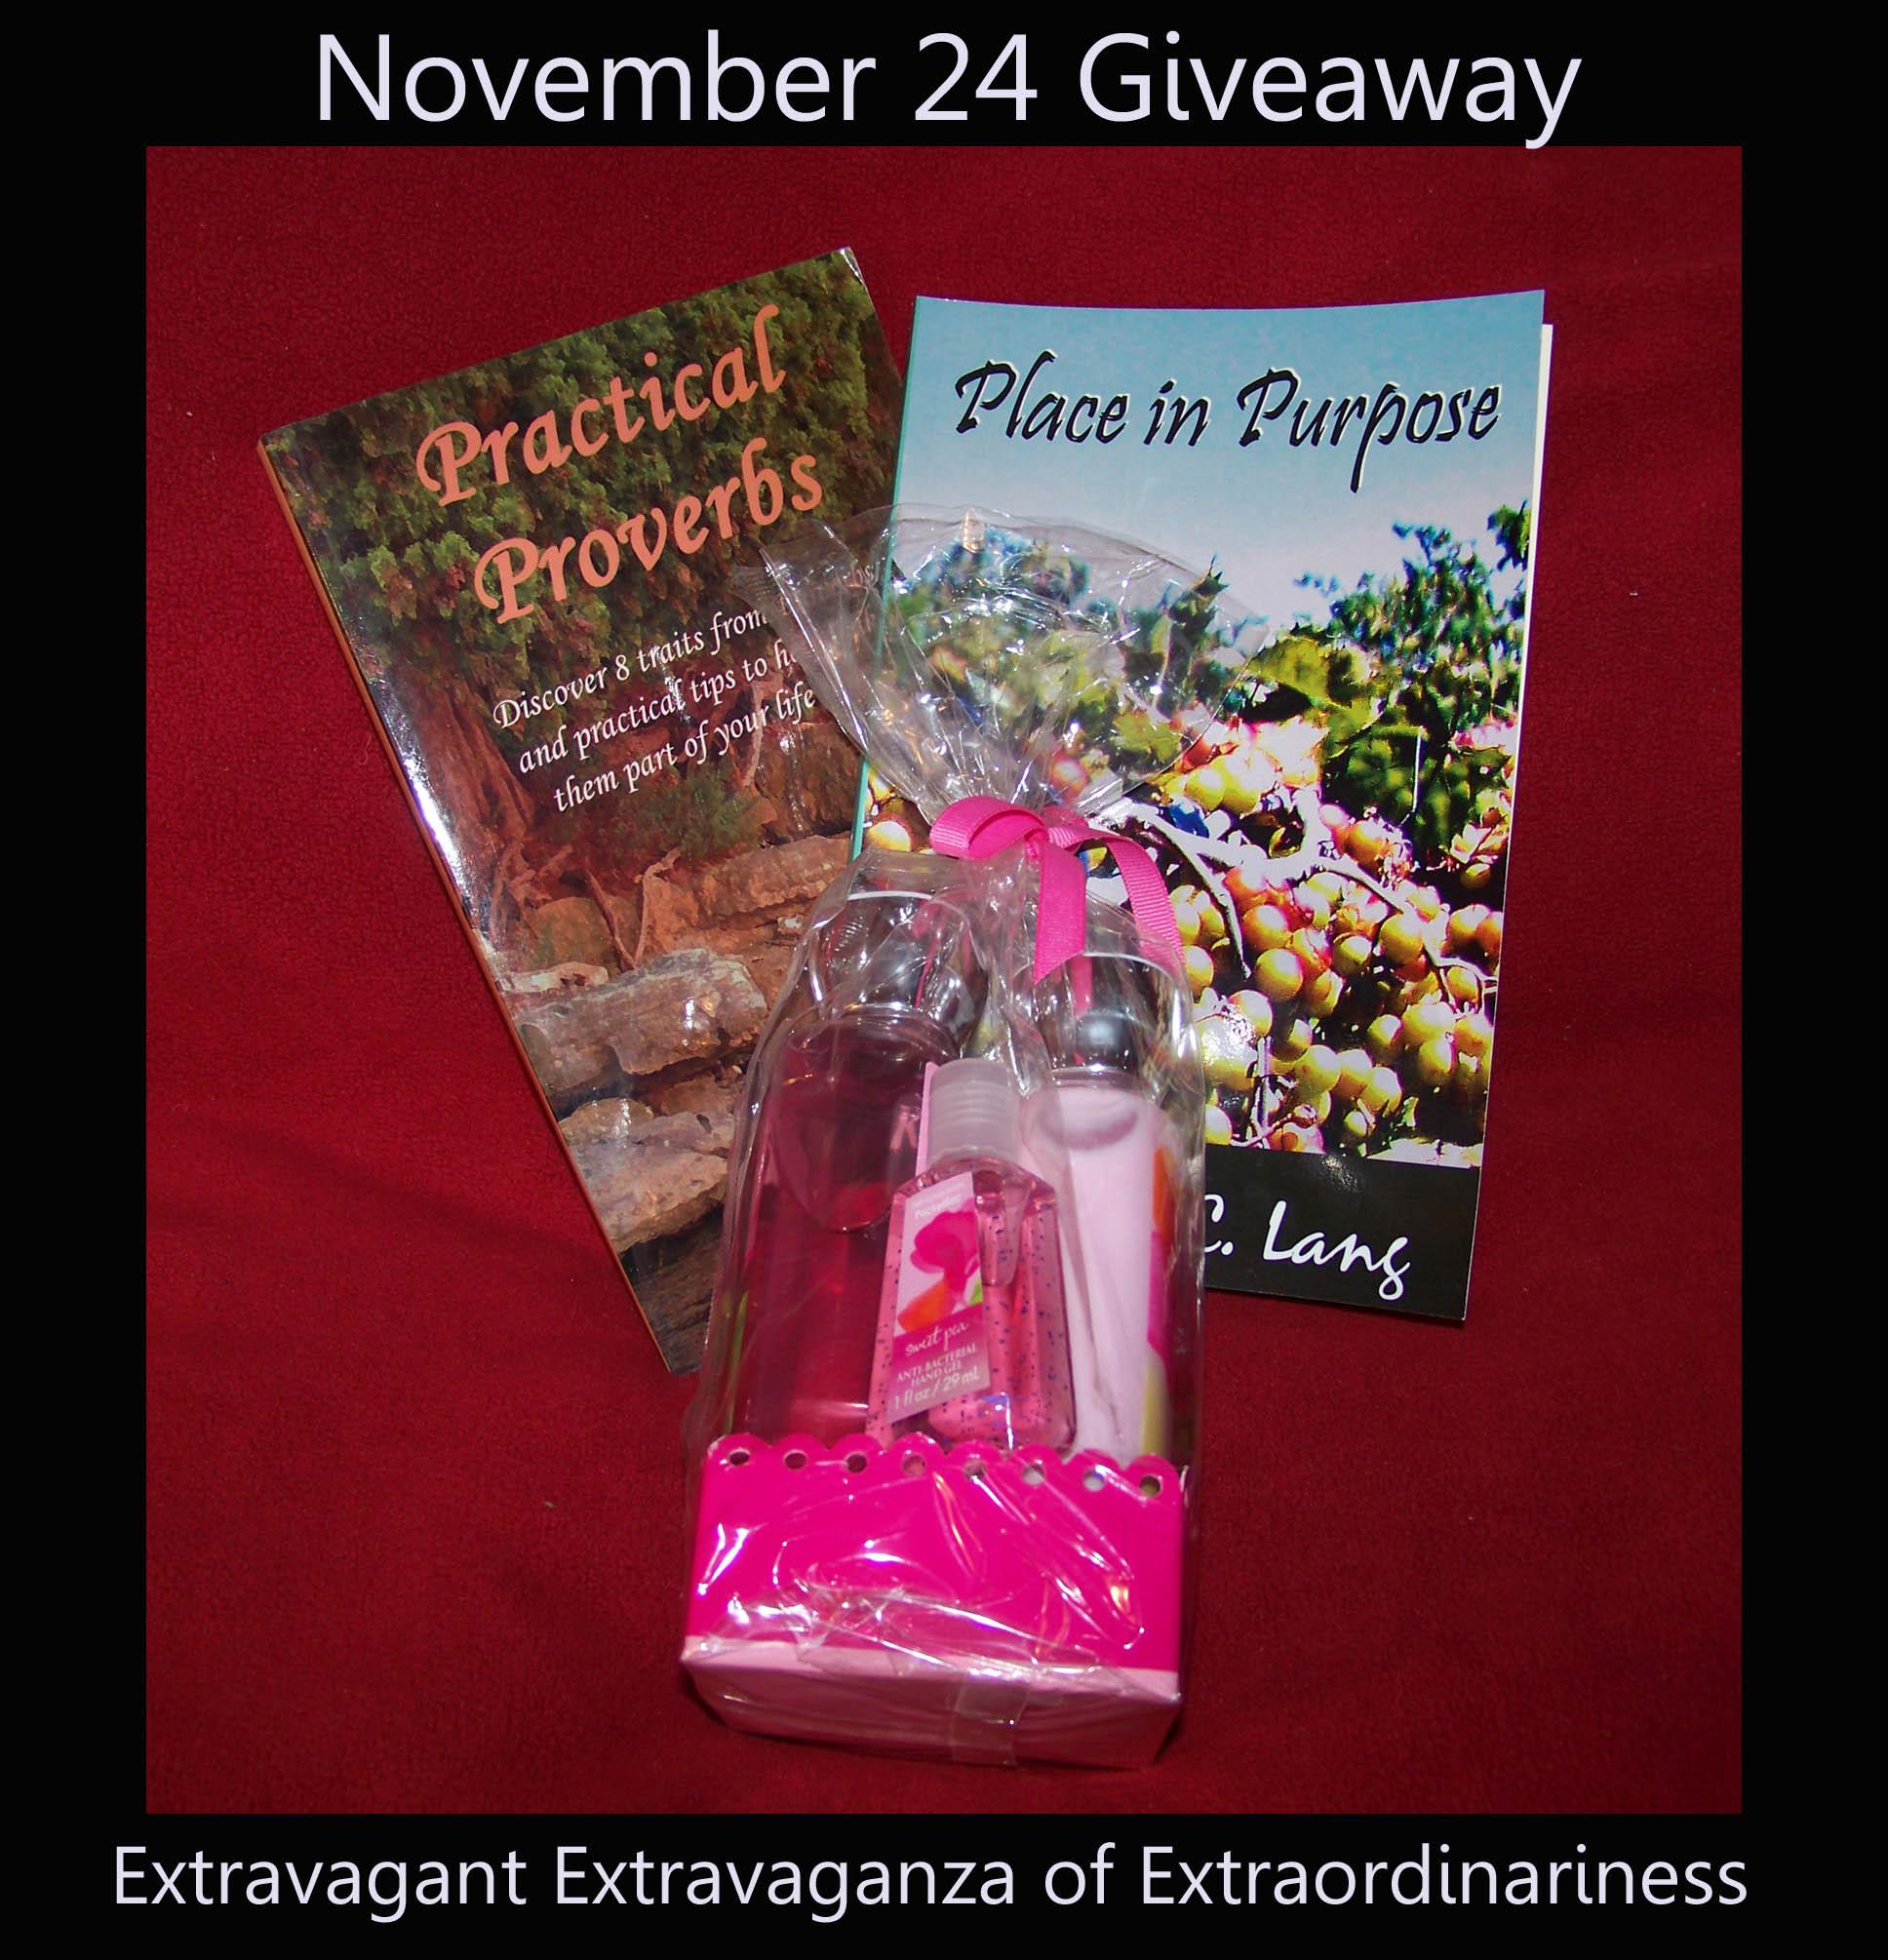 Nov 24 giveaway